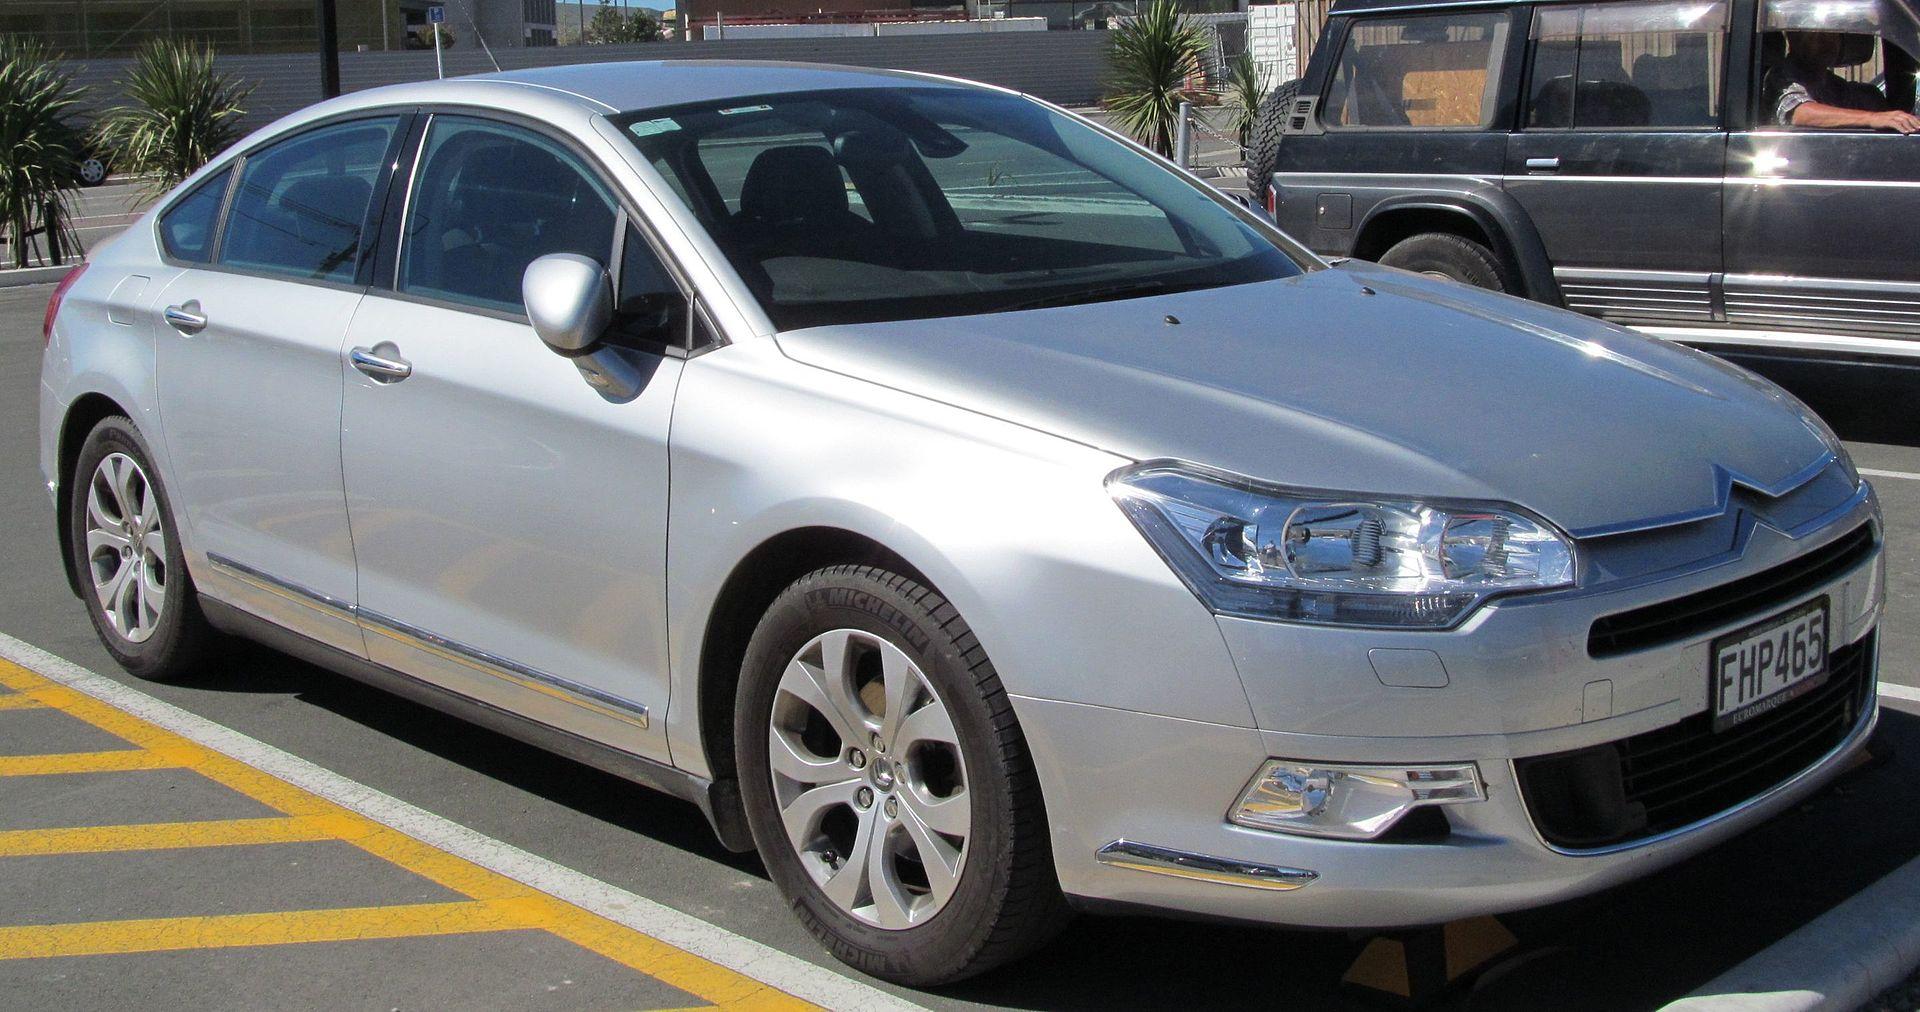 Citroën C5 - Wikipedia